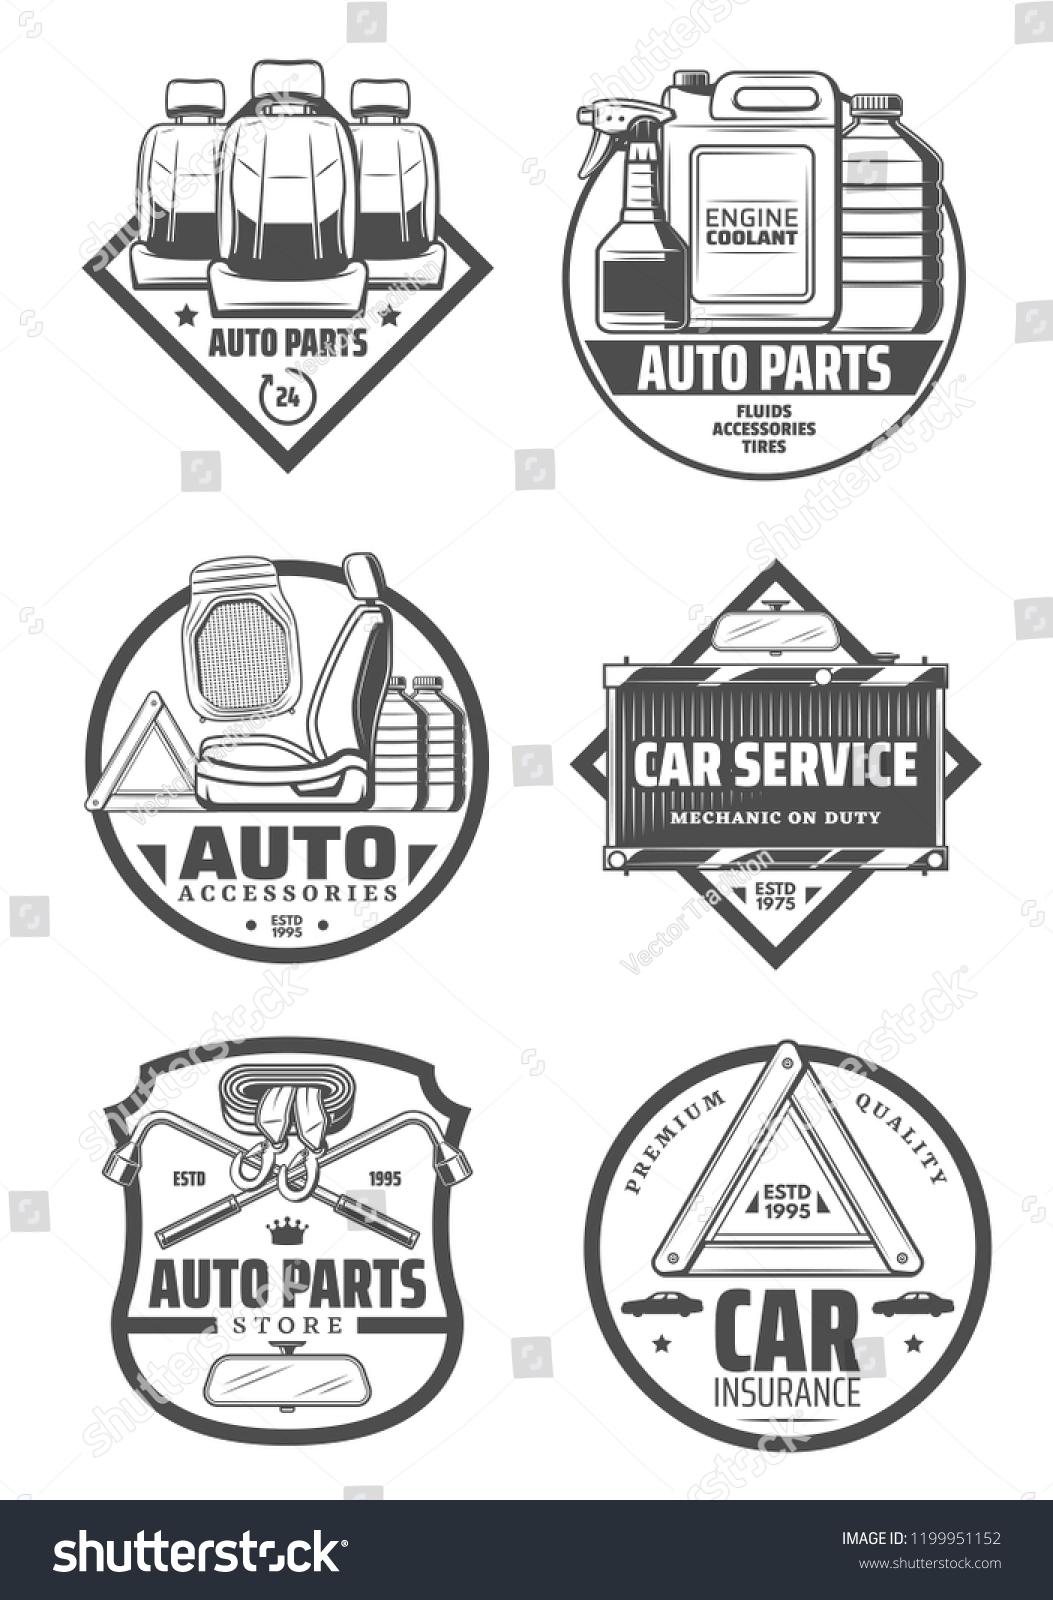 Car Service Store Spare Parts Shop เวกเตอร์สต็อก (ปลอดค่า